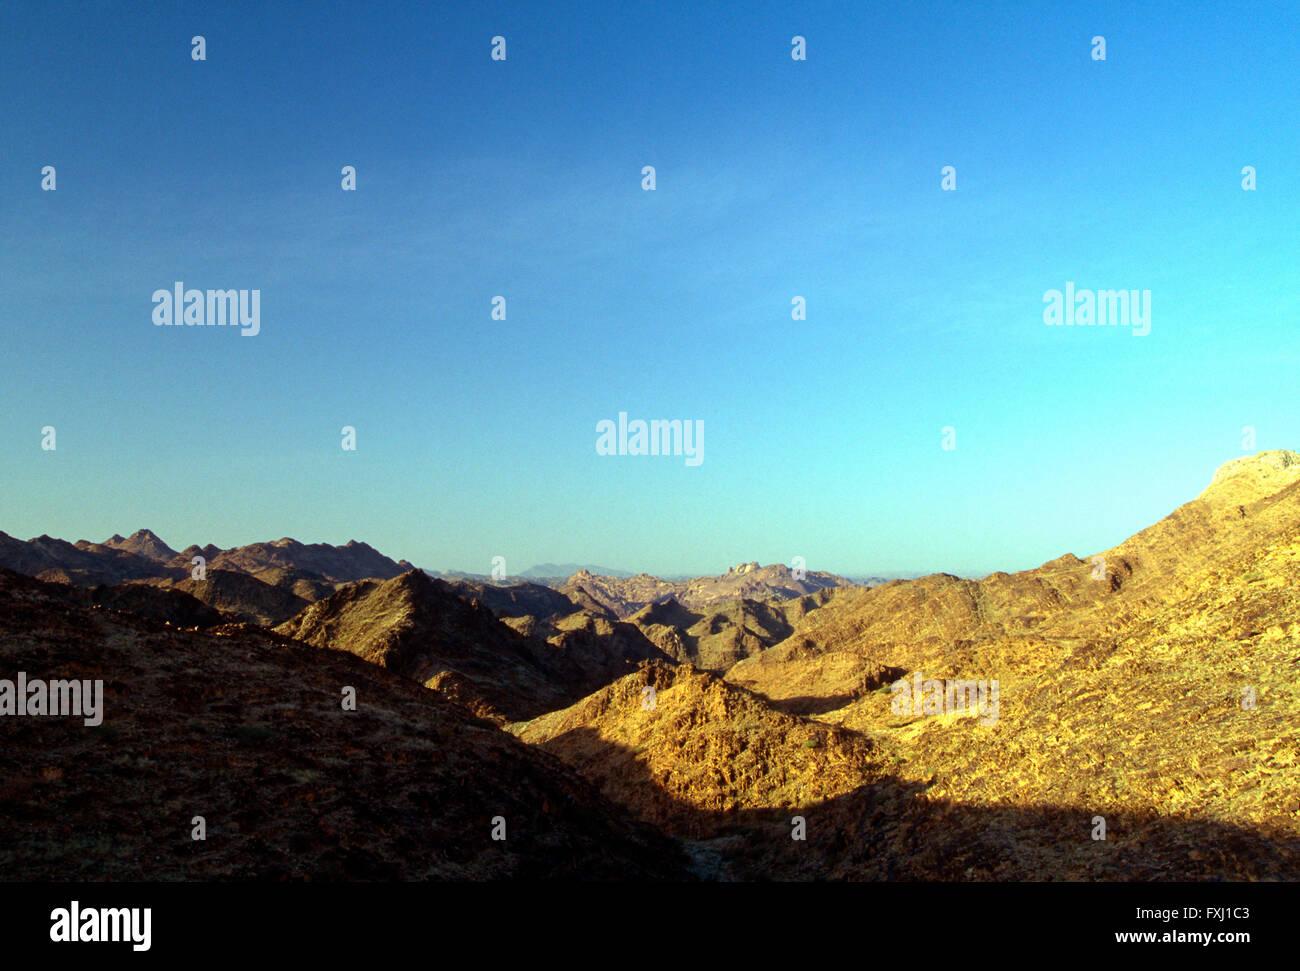 Desert landscape near Bishah; Kingdom of Saudi Arabia - Stock Image